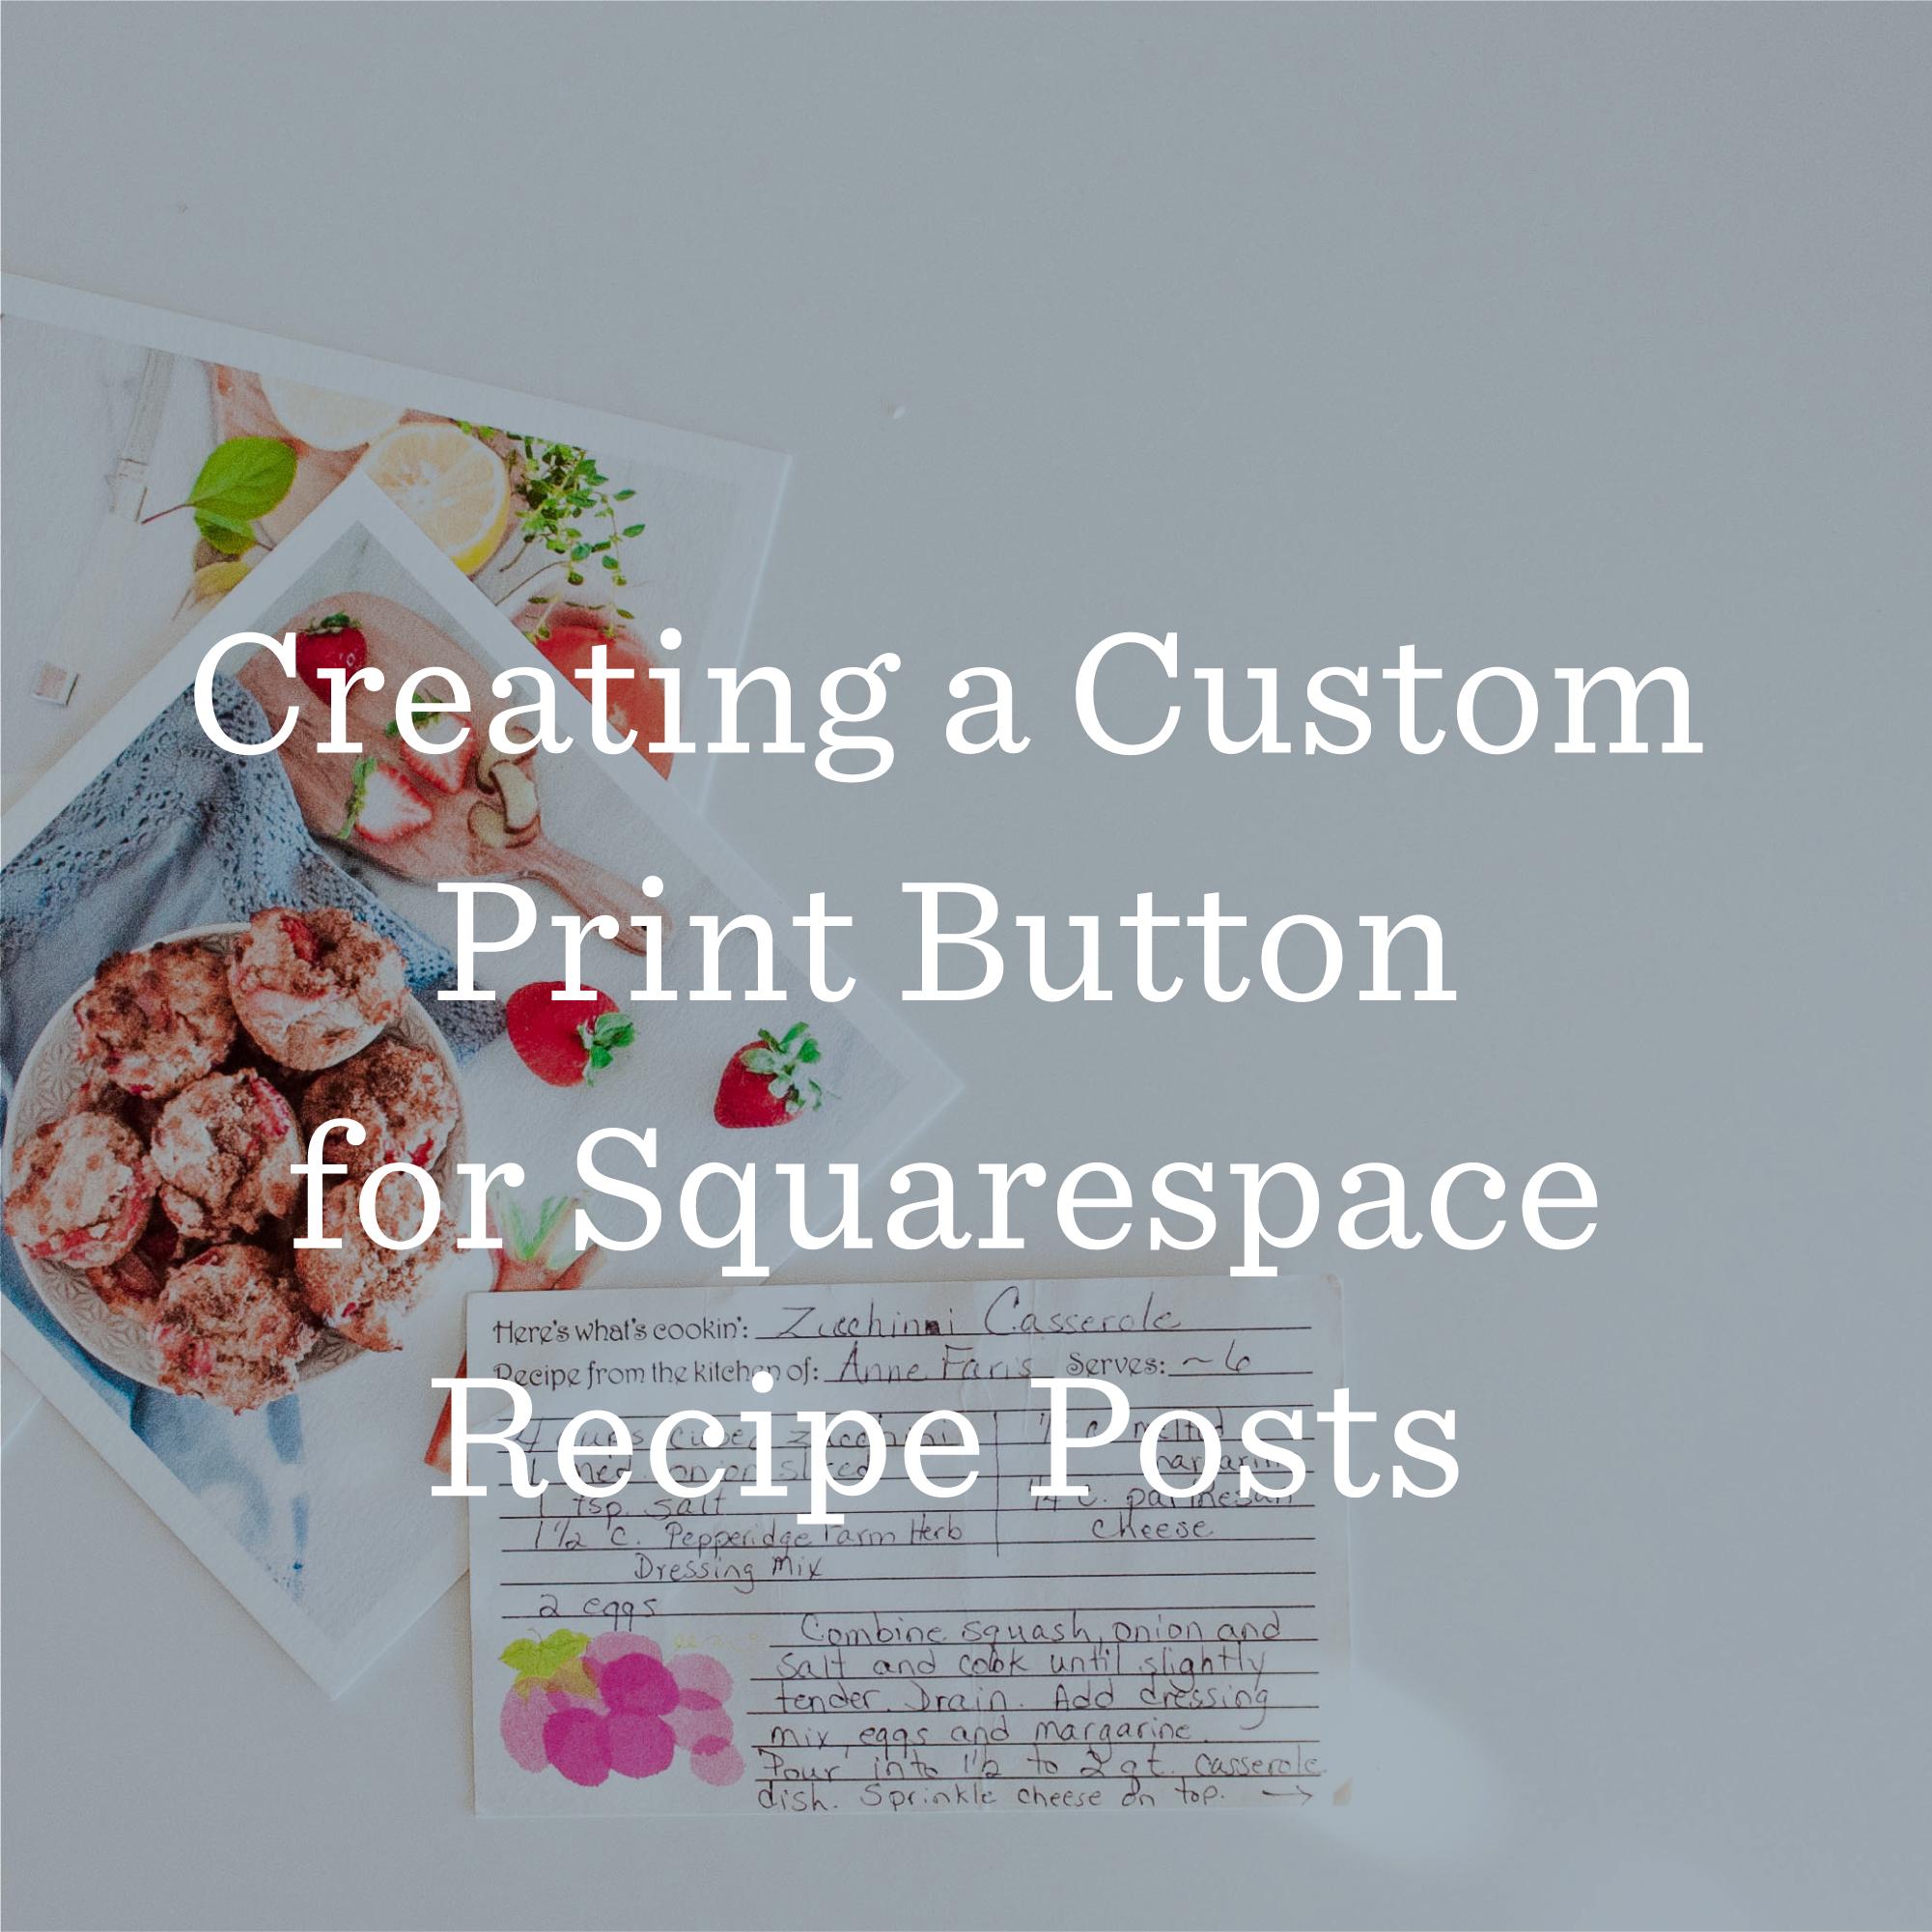 Printing Recipes in Squarespace Plugin